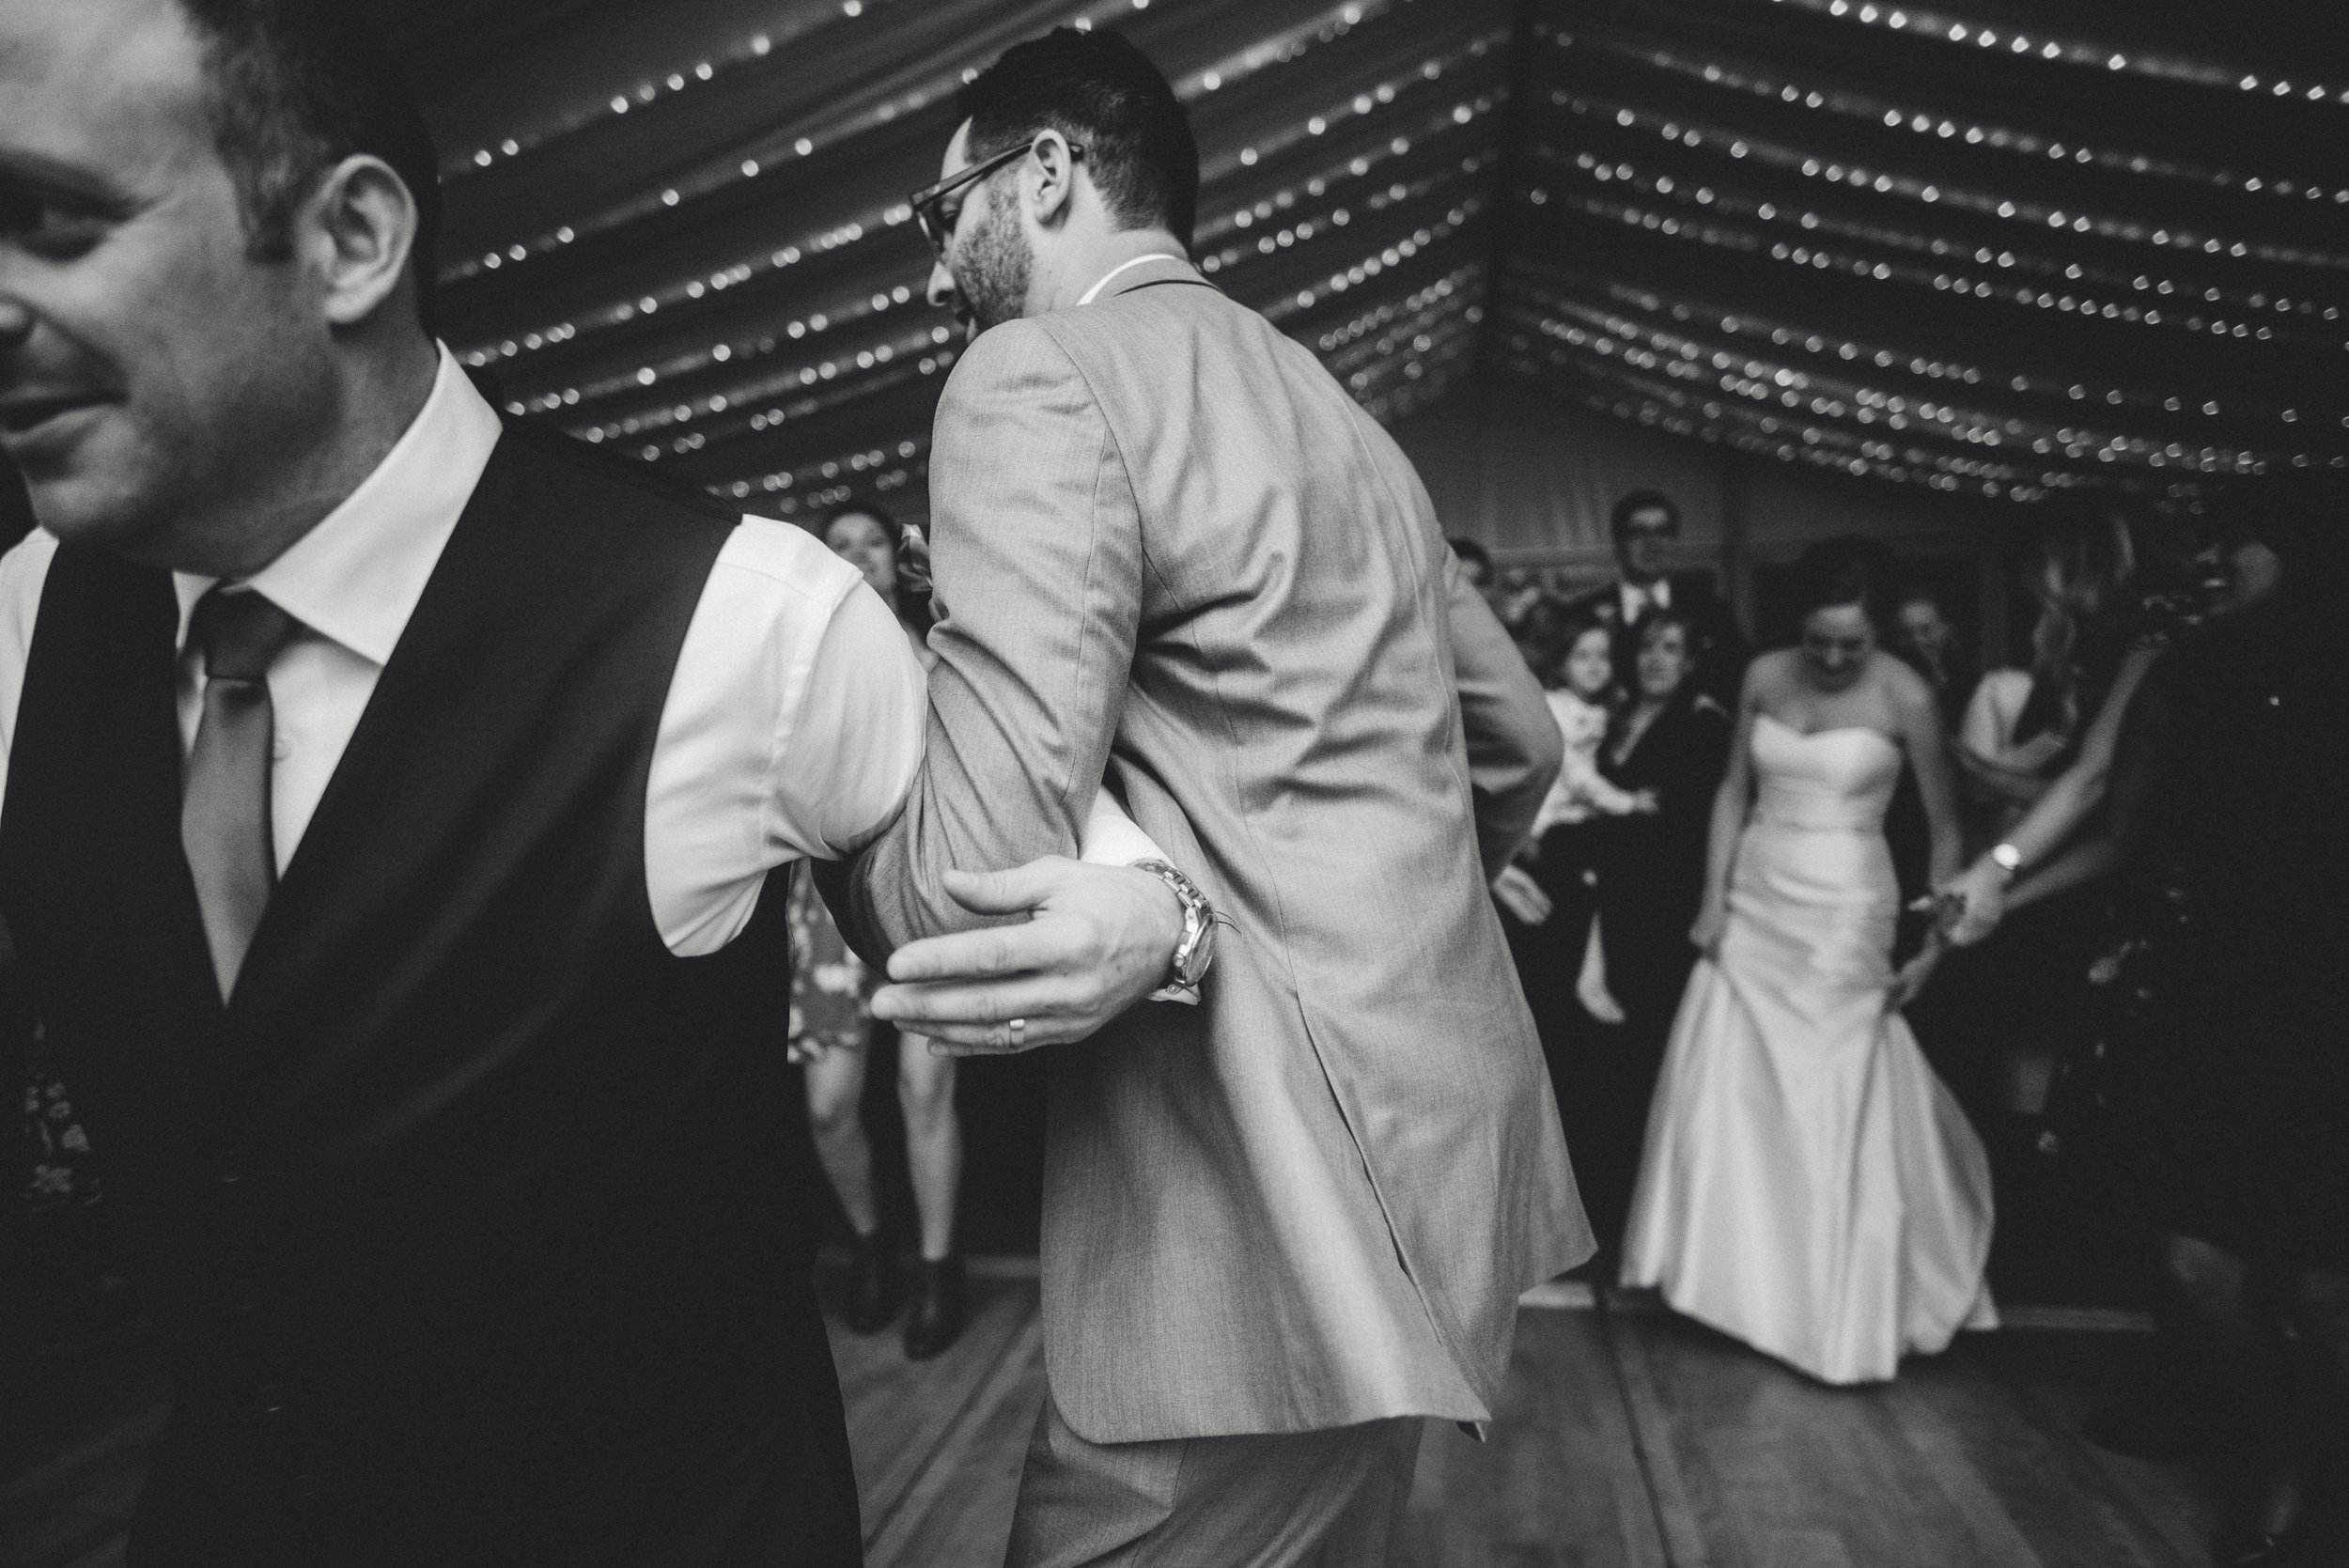 JACQUELINE & ANDREW WARSHAWER -BROOKMILL FARM FALL WEDDING - INTIMATE WEDDING PHOTOGRAPHER - TWOTWENTY by CHI-CHI AGBIM-674.jpg